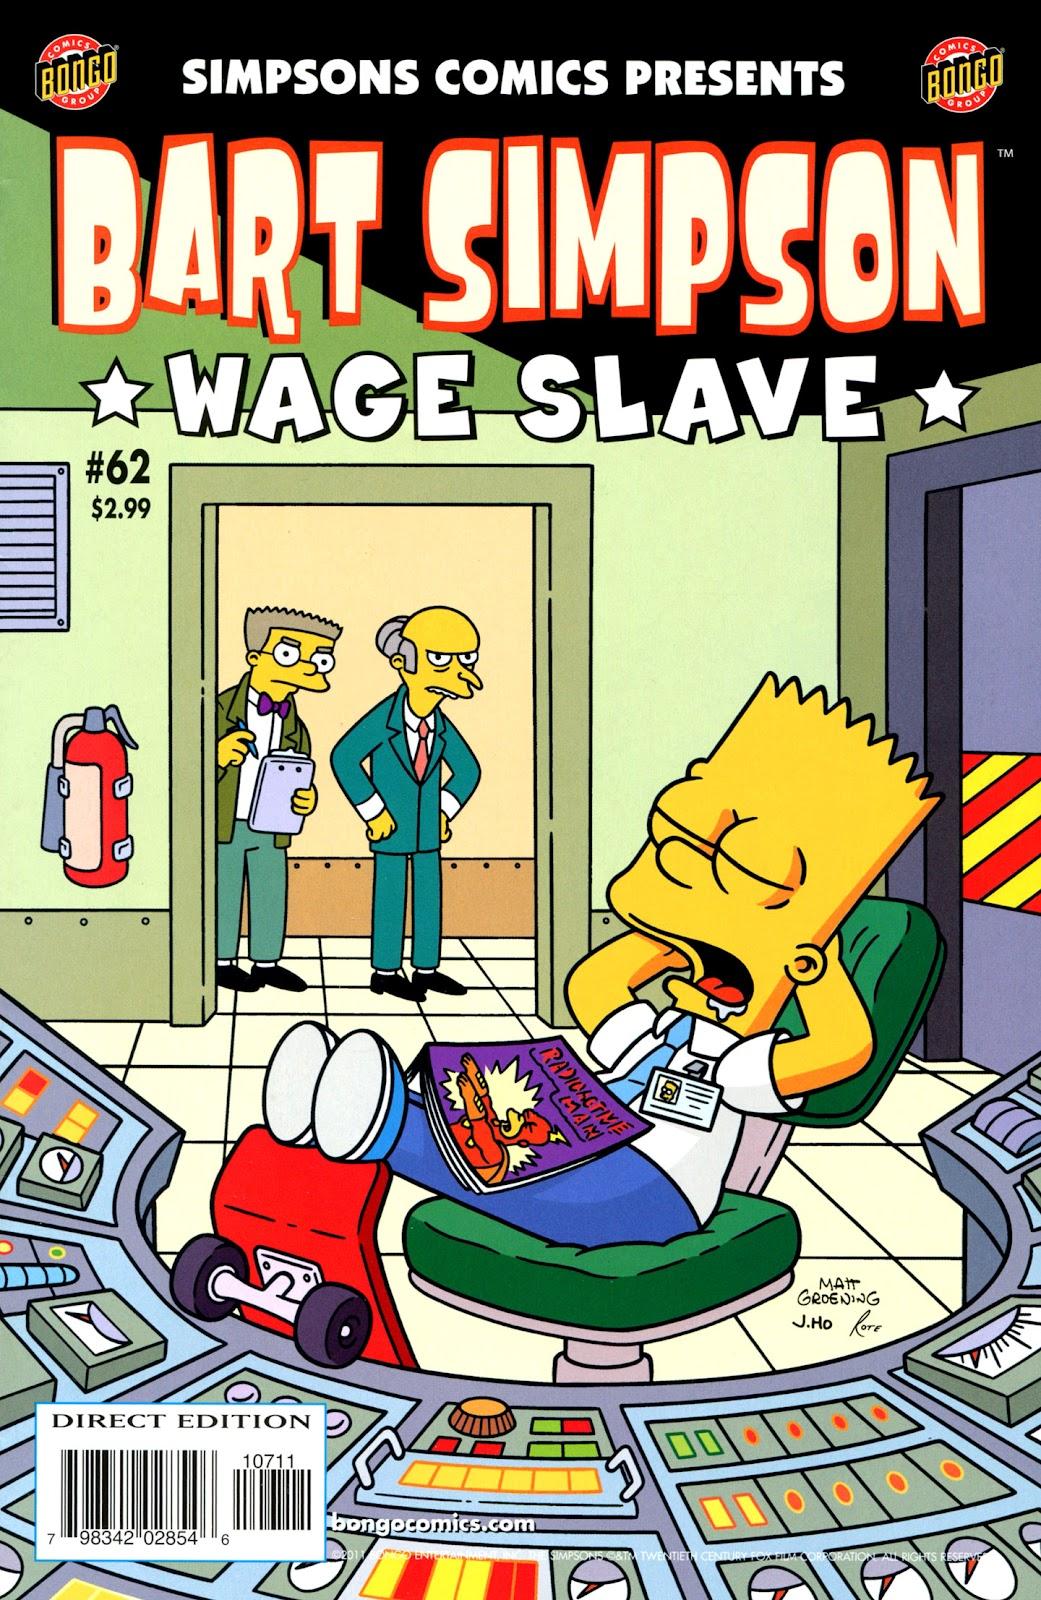 Simpsons Comics Presents Bart Simpson 62 Page 1